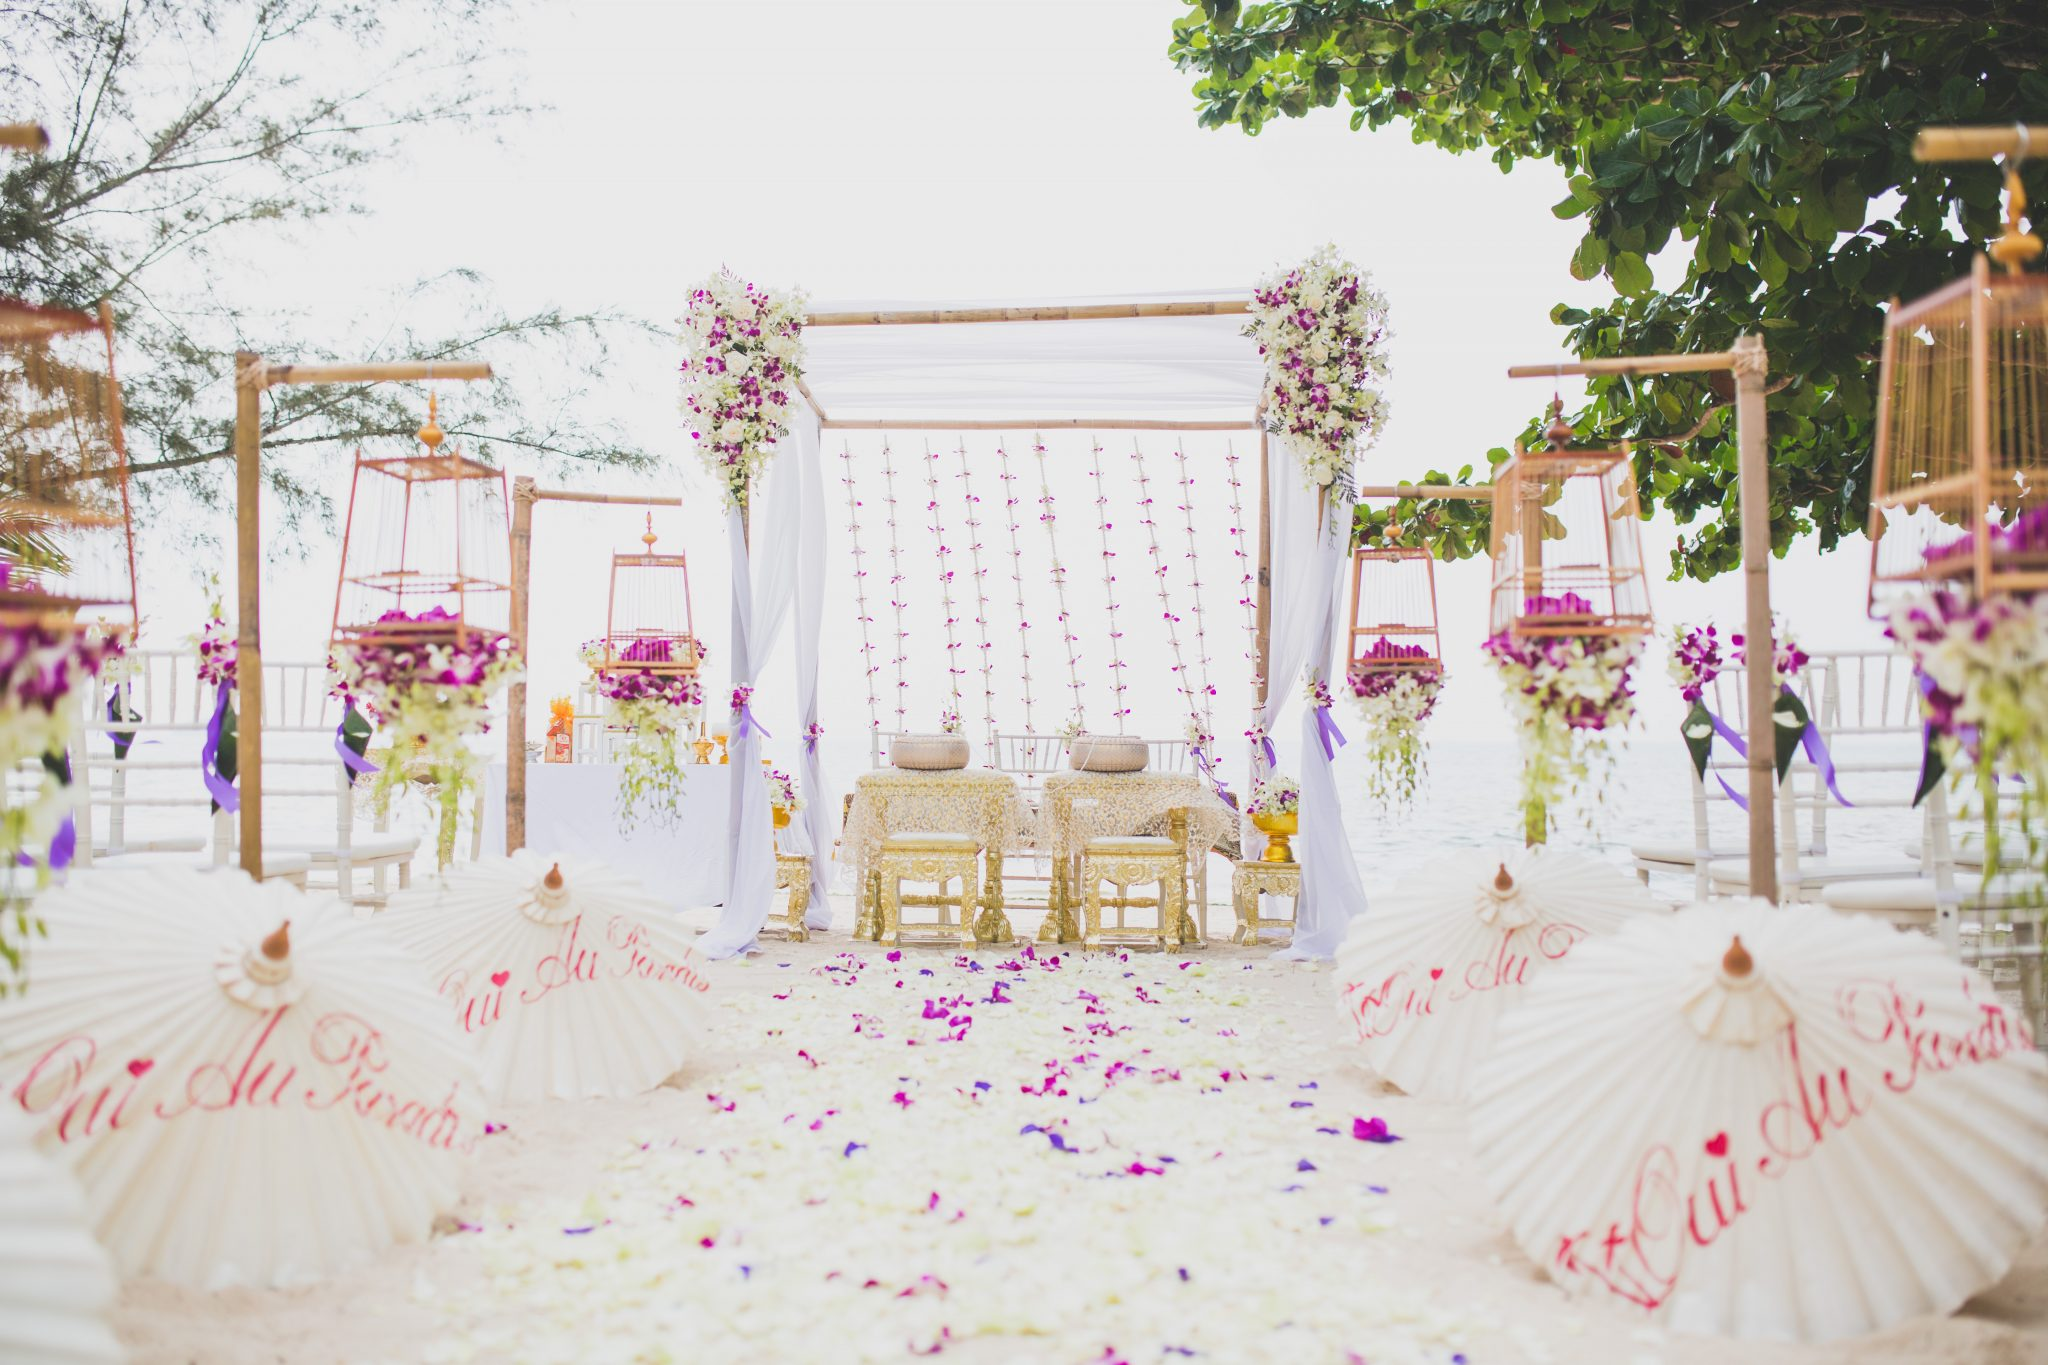 Organisation-Mariage-marier-maries-mariee-ceremonie-Thailande-Plage-ile-Koh-Samui-Island-thai-evenementiel-evenements-demande-fiancailles-EVJF-EVG-noces-voyages-Wedding-ceremony-Planner-Thailand-Beach-Events-event-request-bachelor-bachelorette-groom-bride-bridal-chairs-tables-flowers-candles-chaises-tables-fleurs-bougies-gazebo-50